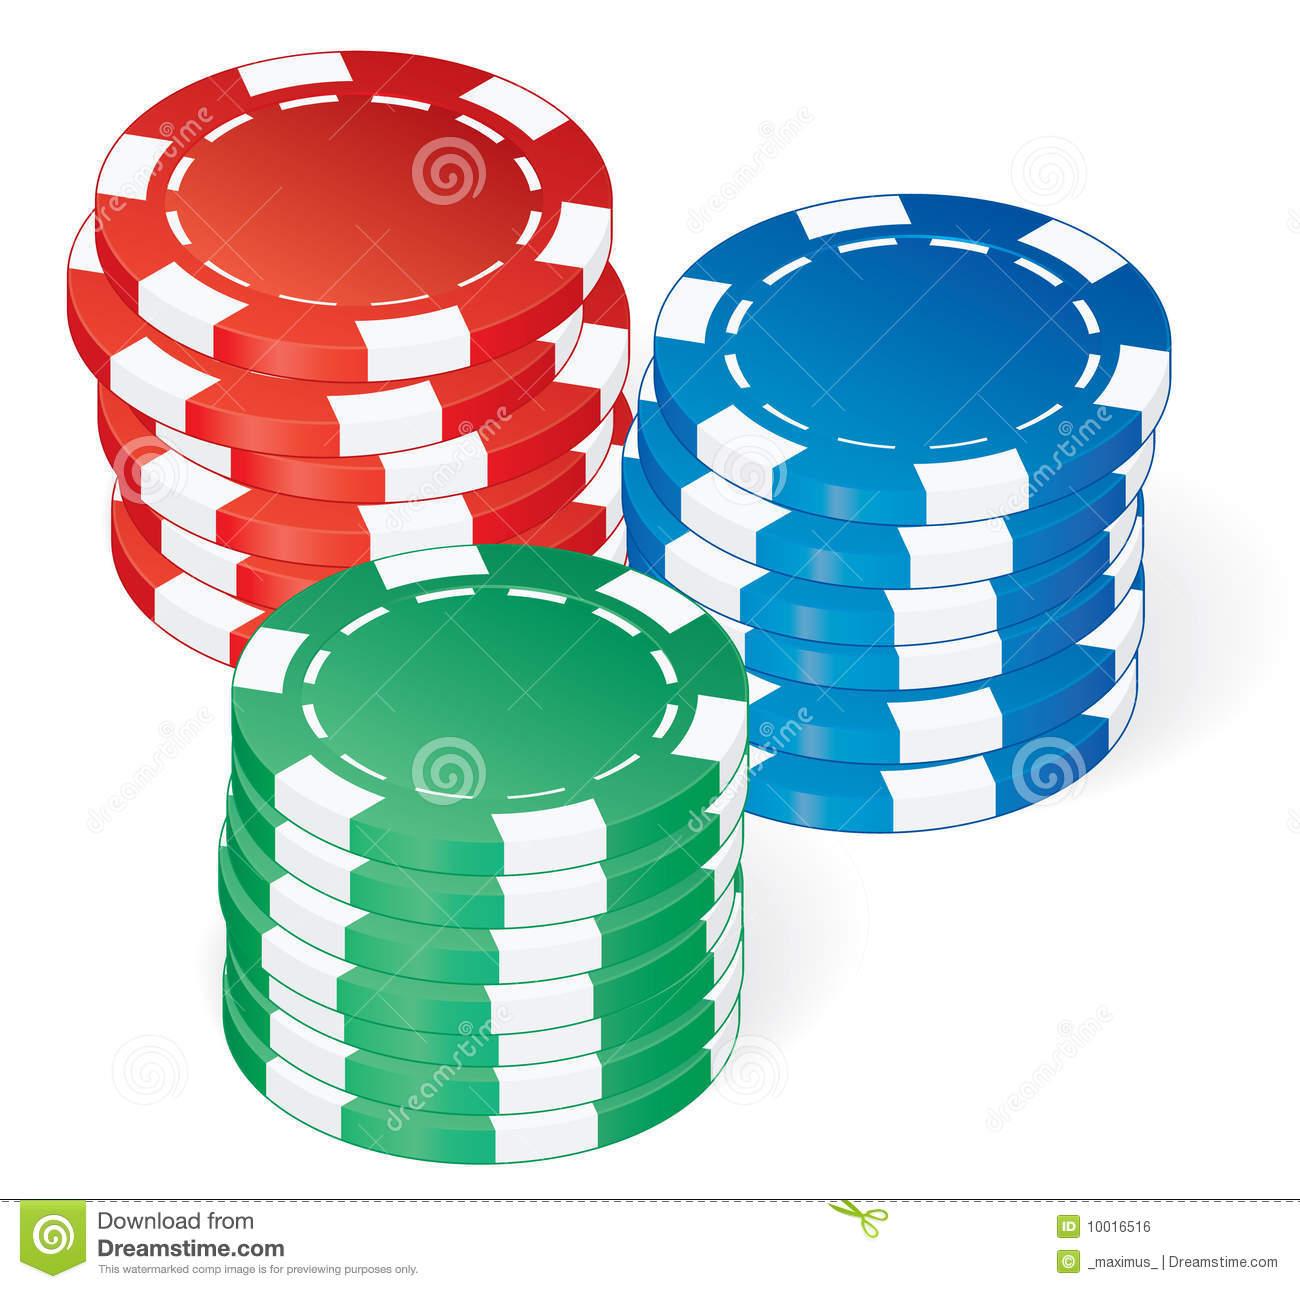 Poker chips clipart / Lake cumberland poker run 2018.